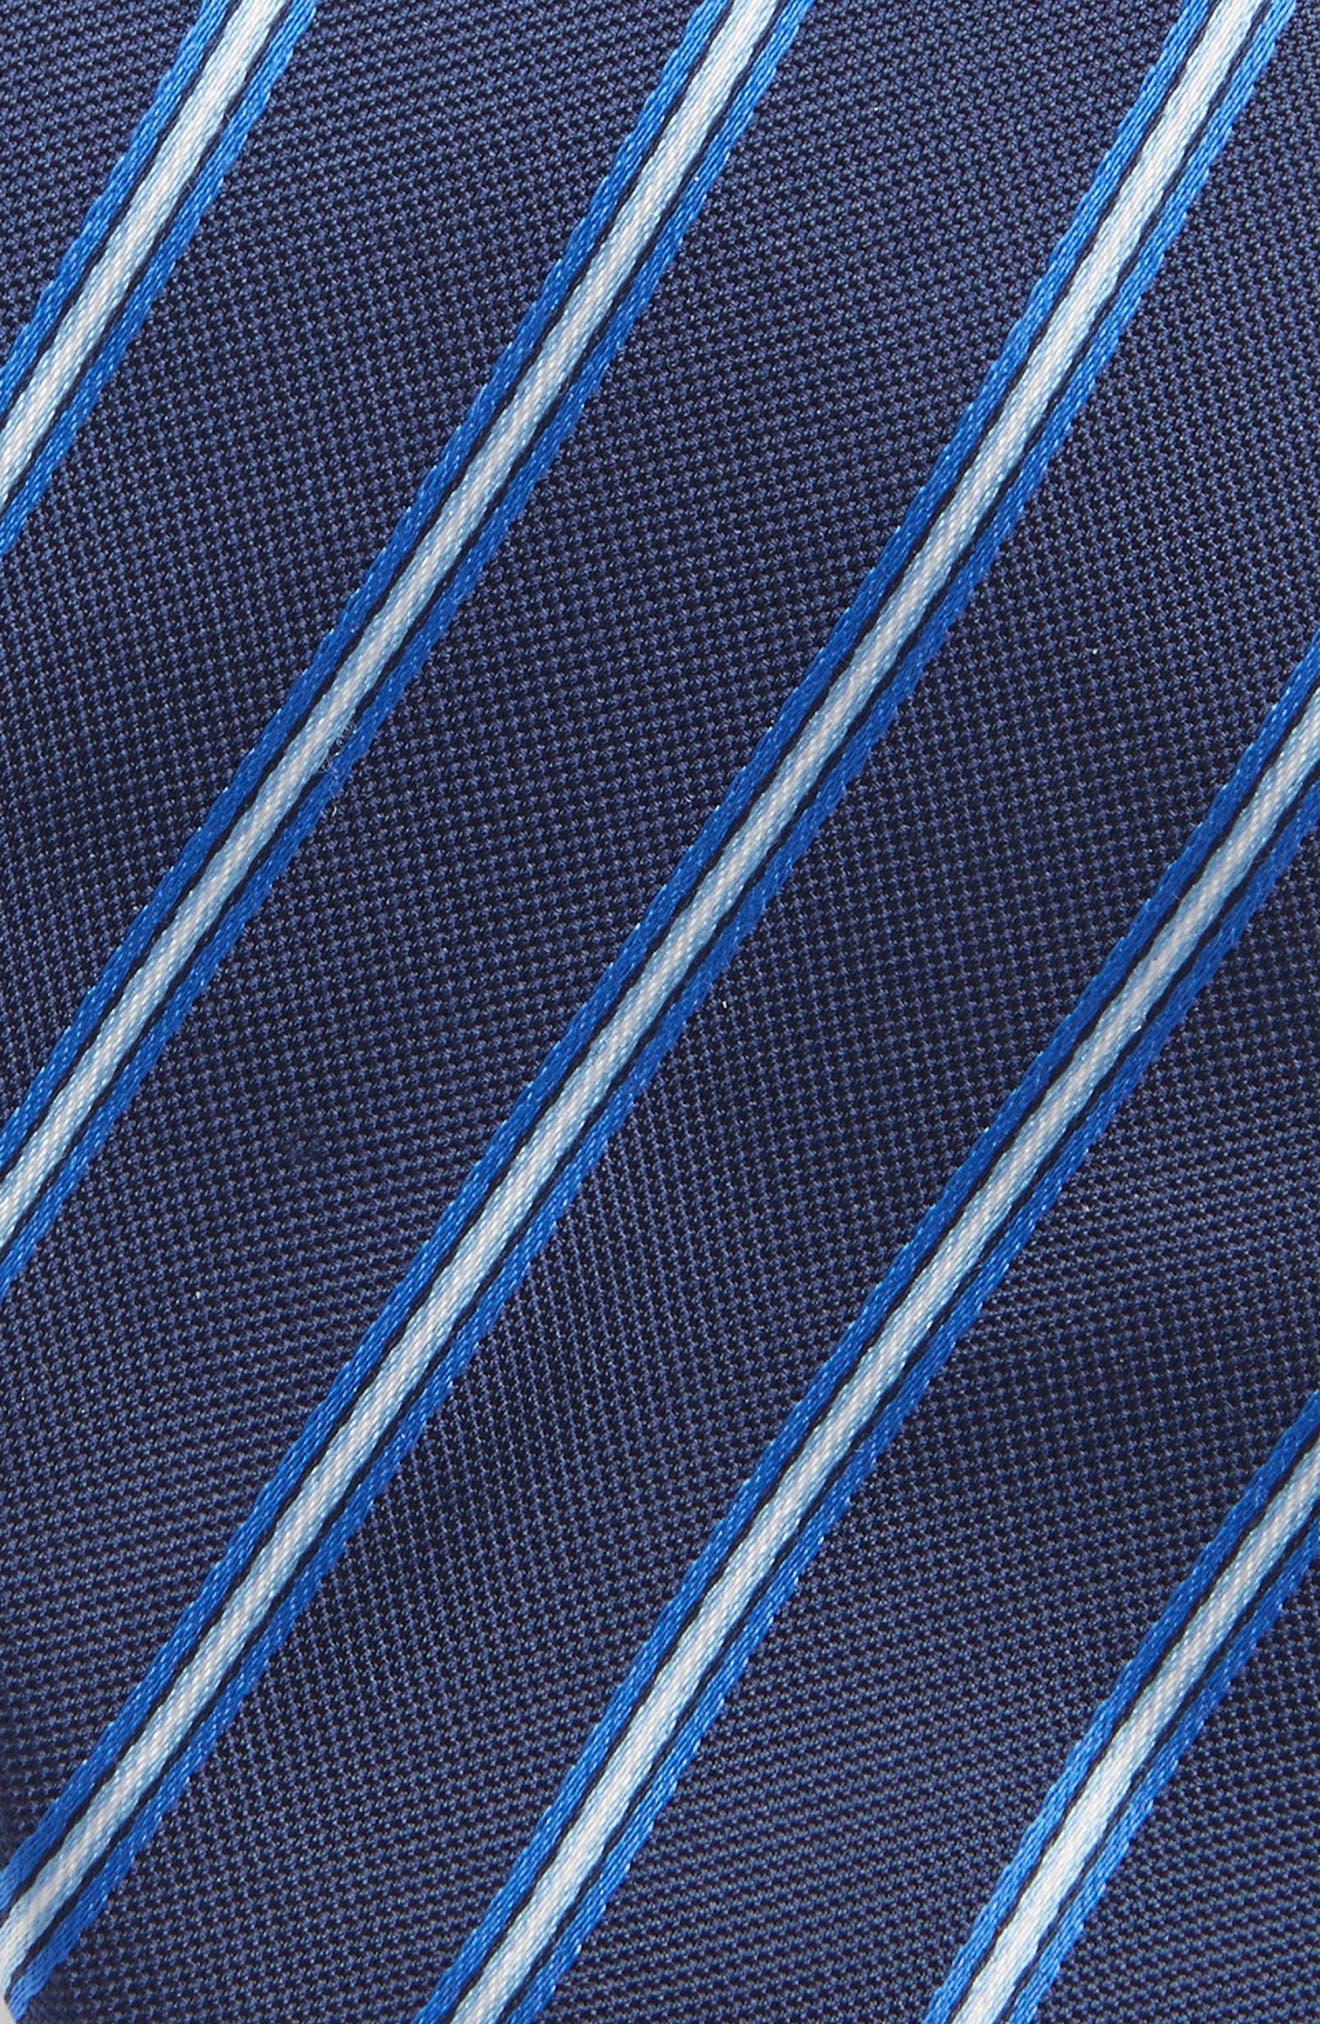 Stripe Silk Tie,                             Alternate thumbnail 2, color,                             OPEN BLUE